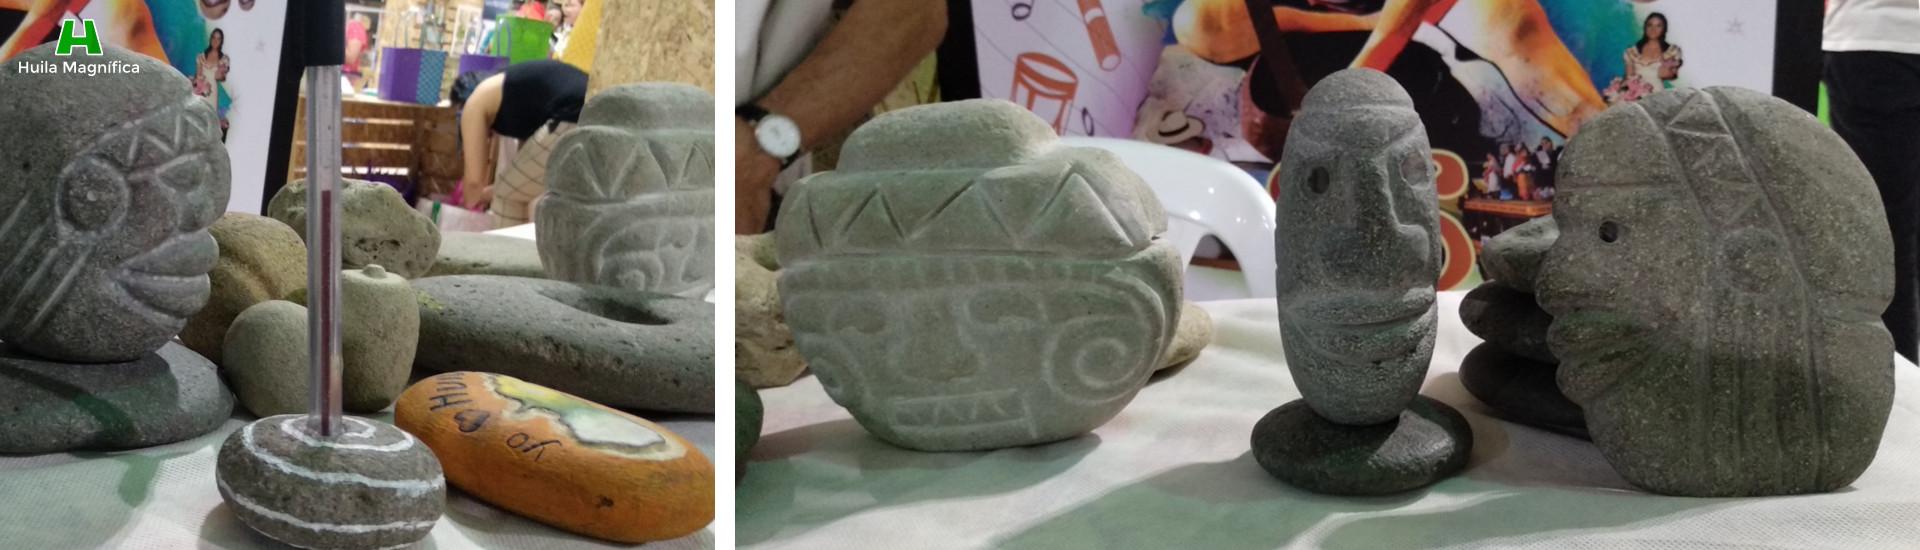 Dainer Morera Cabrera - Esculturas Líticas del Huila - Huila Magnifica Slider